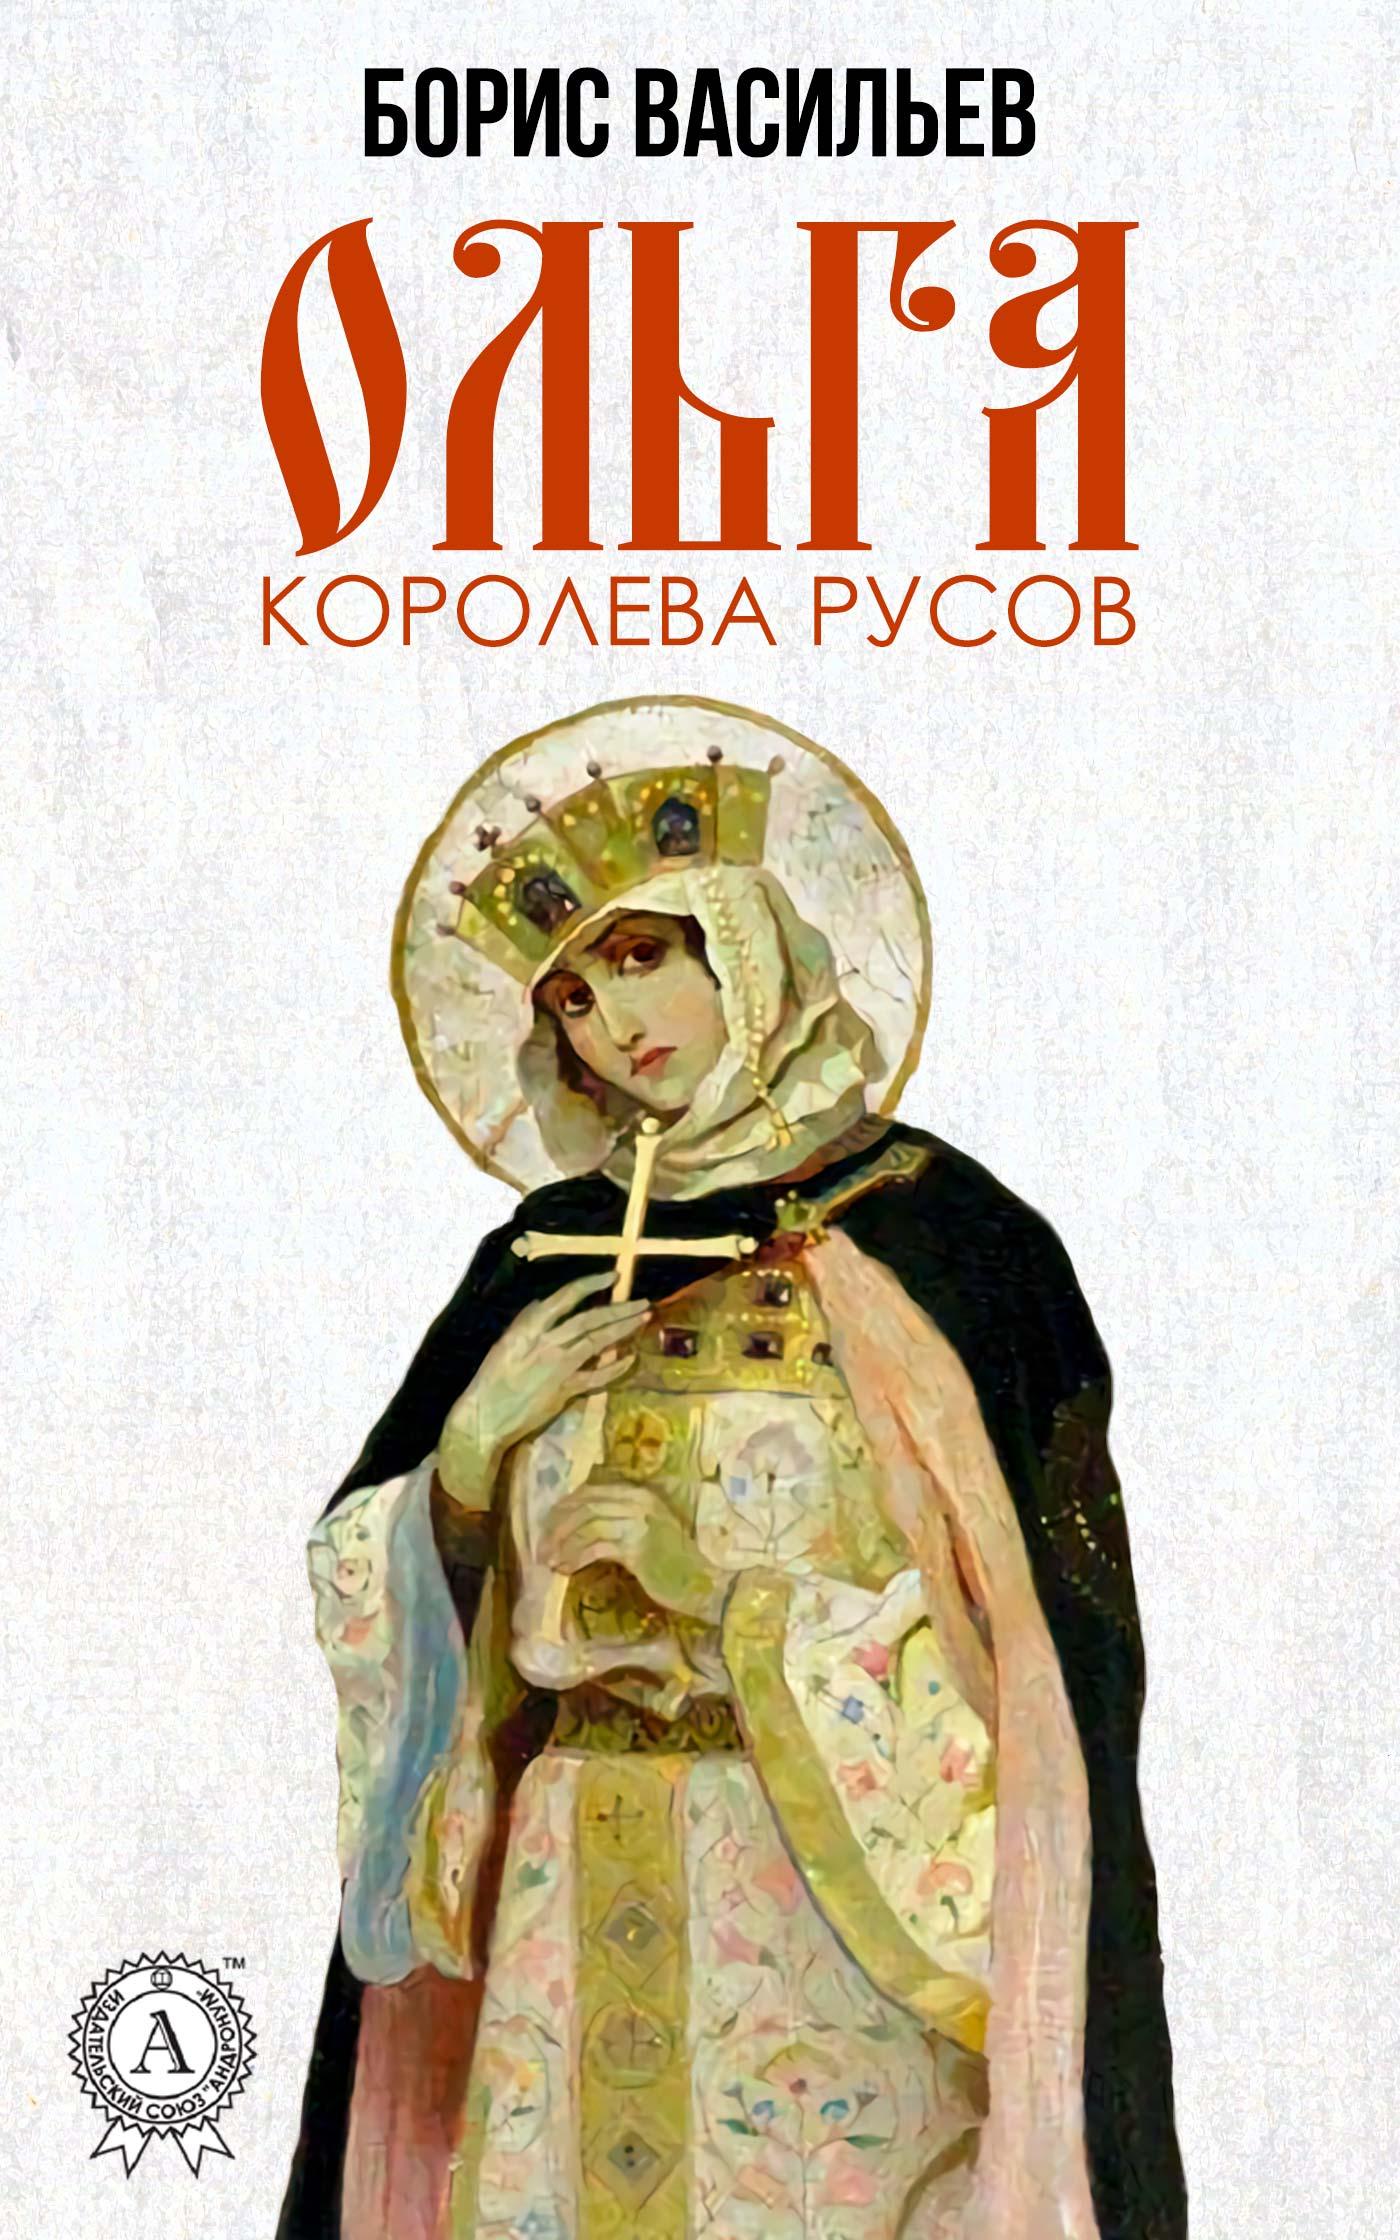 Борис Васильєв Ольга, королева русов